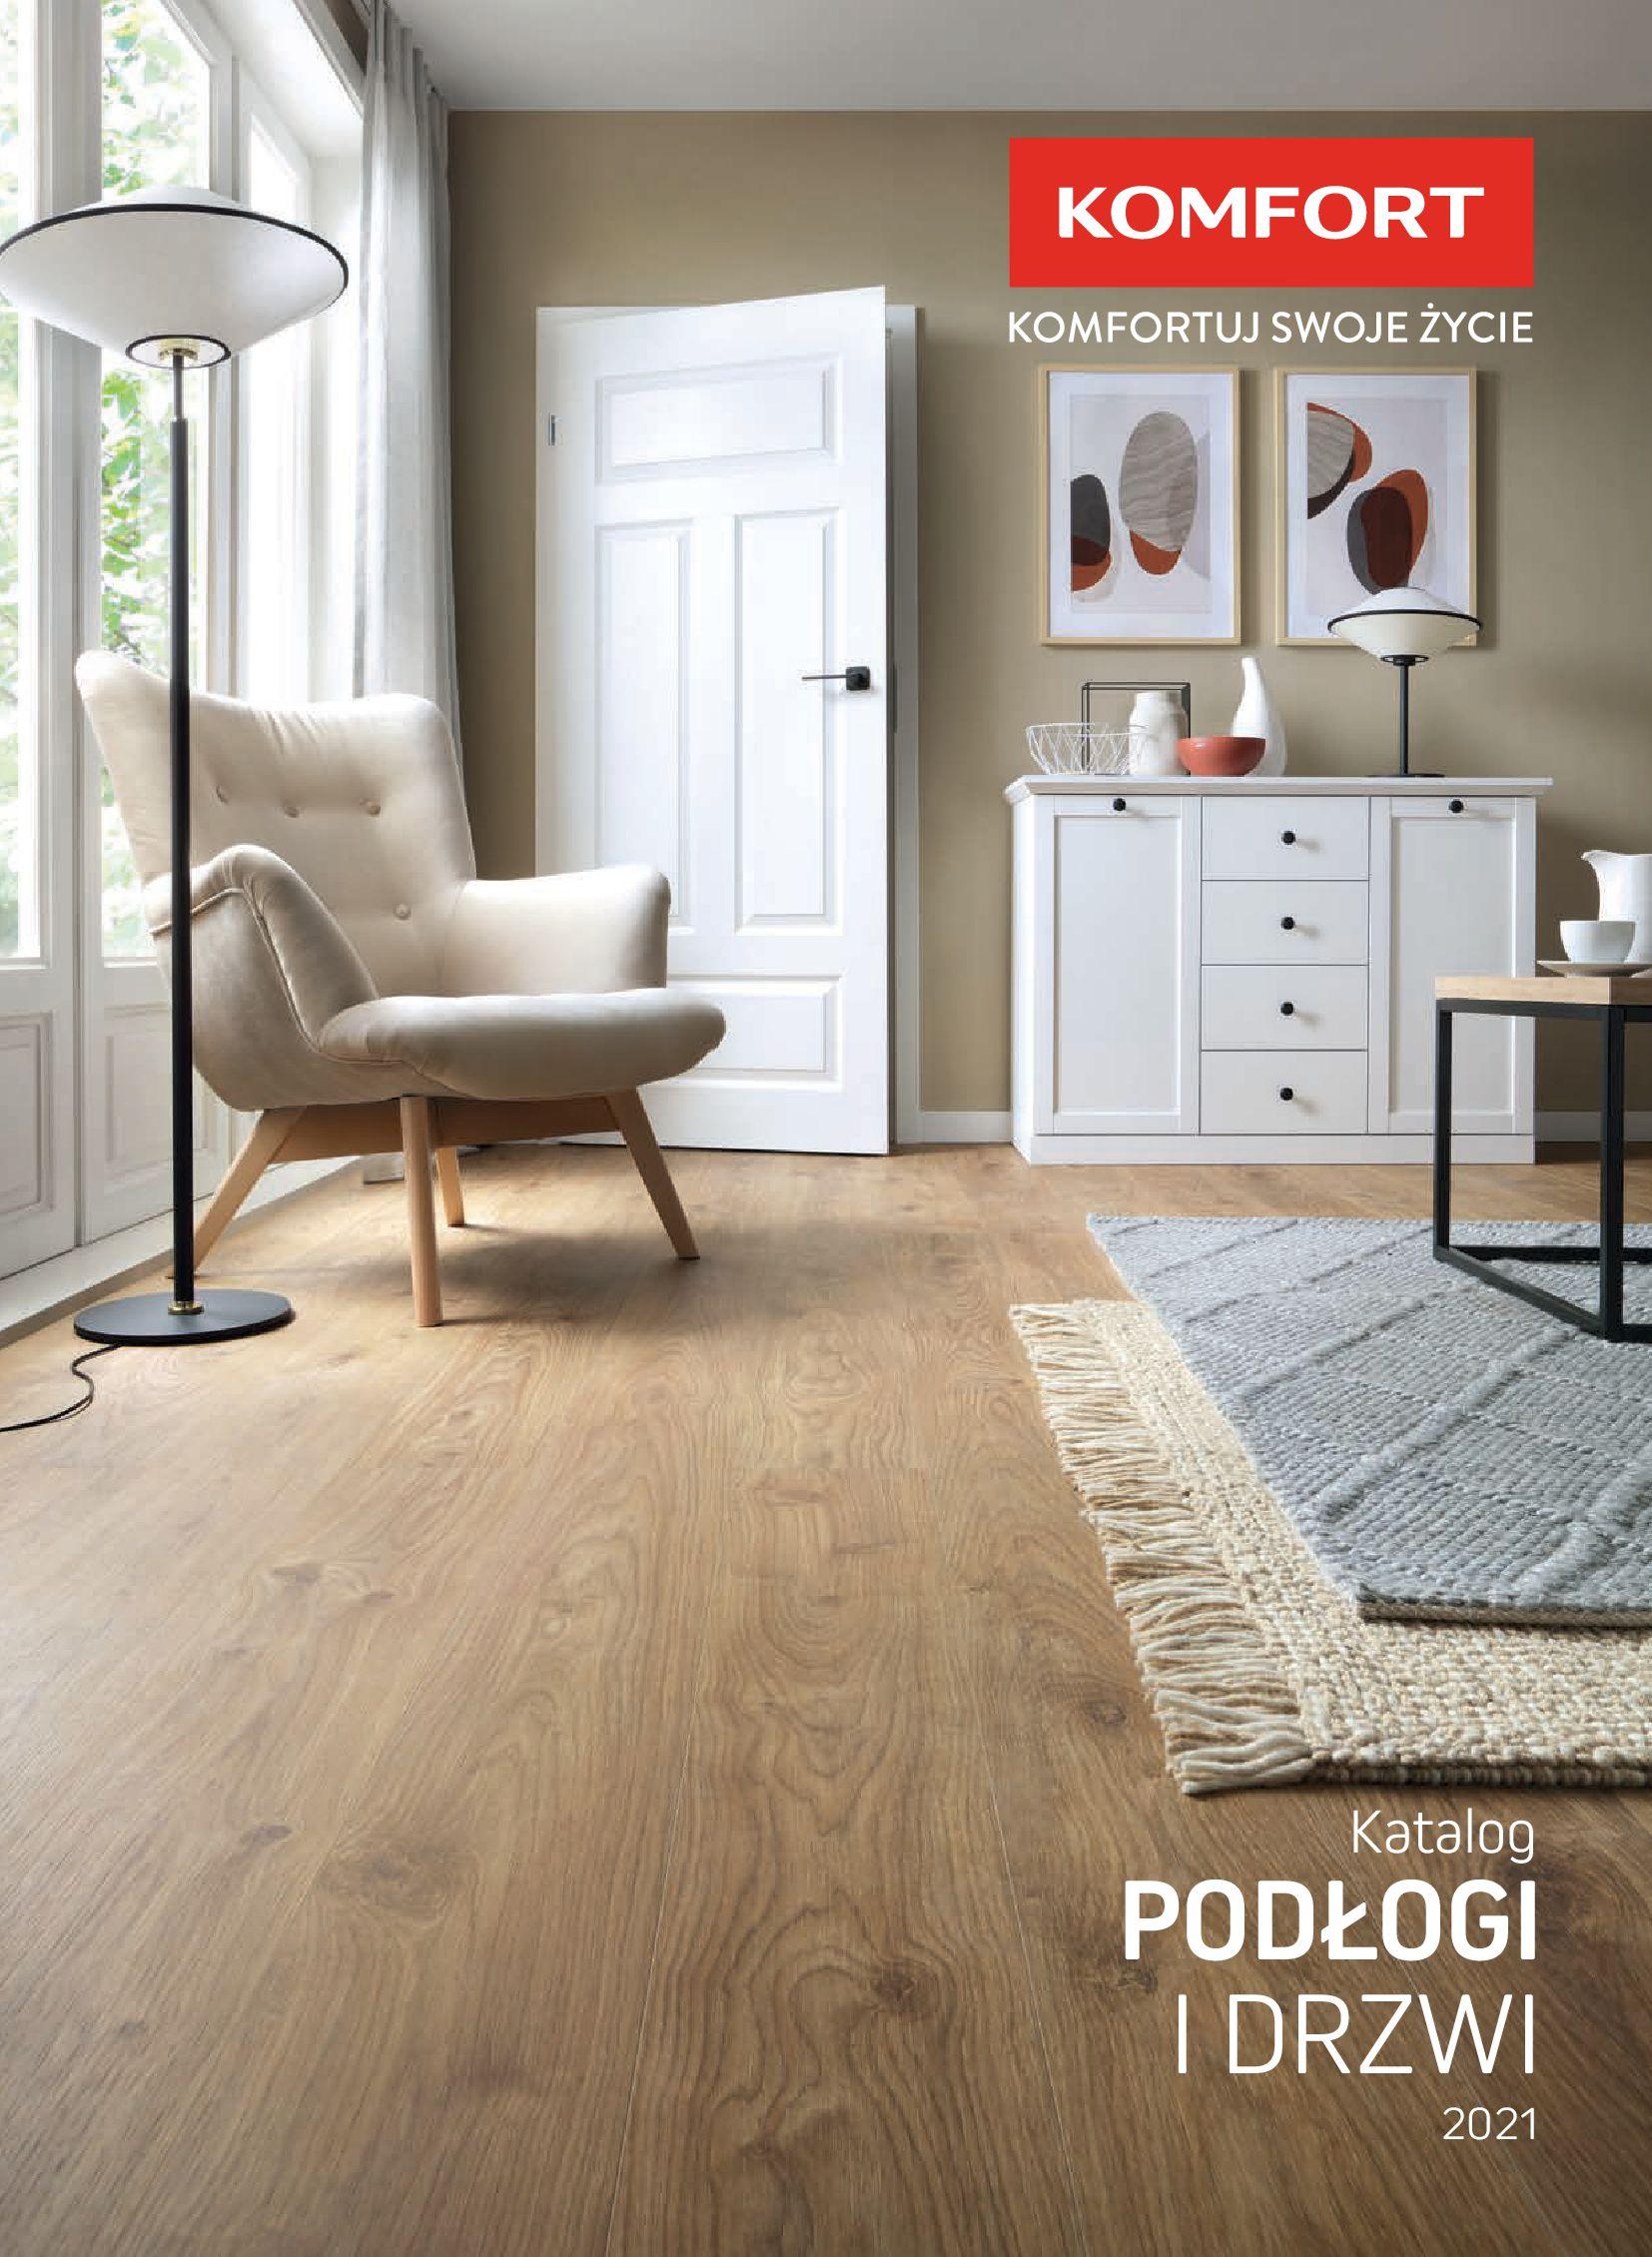 Komfort:  Gazetka Komfort - Katalog podłogi i drzwi 15.06.2021